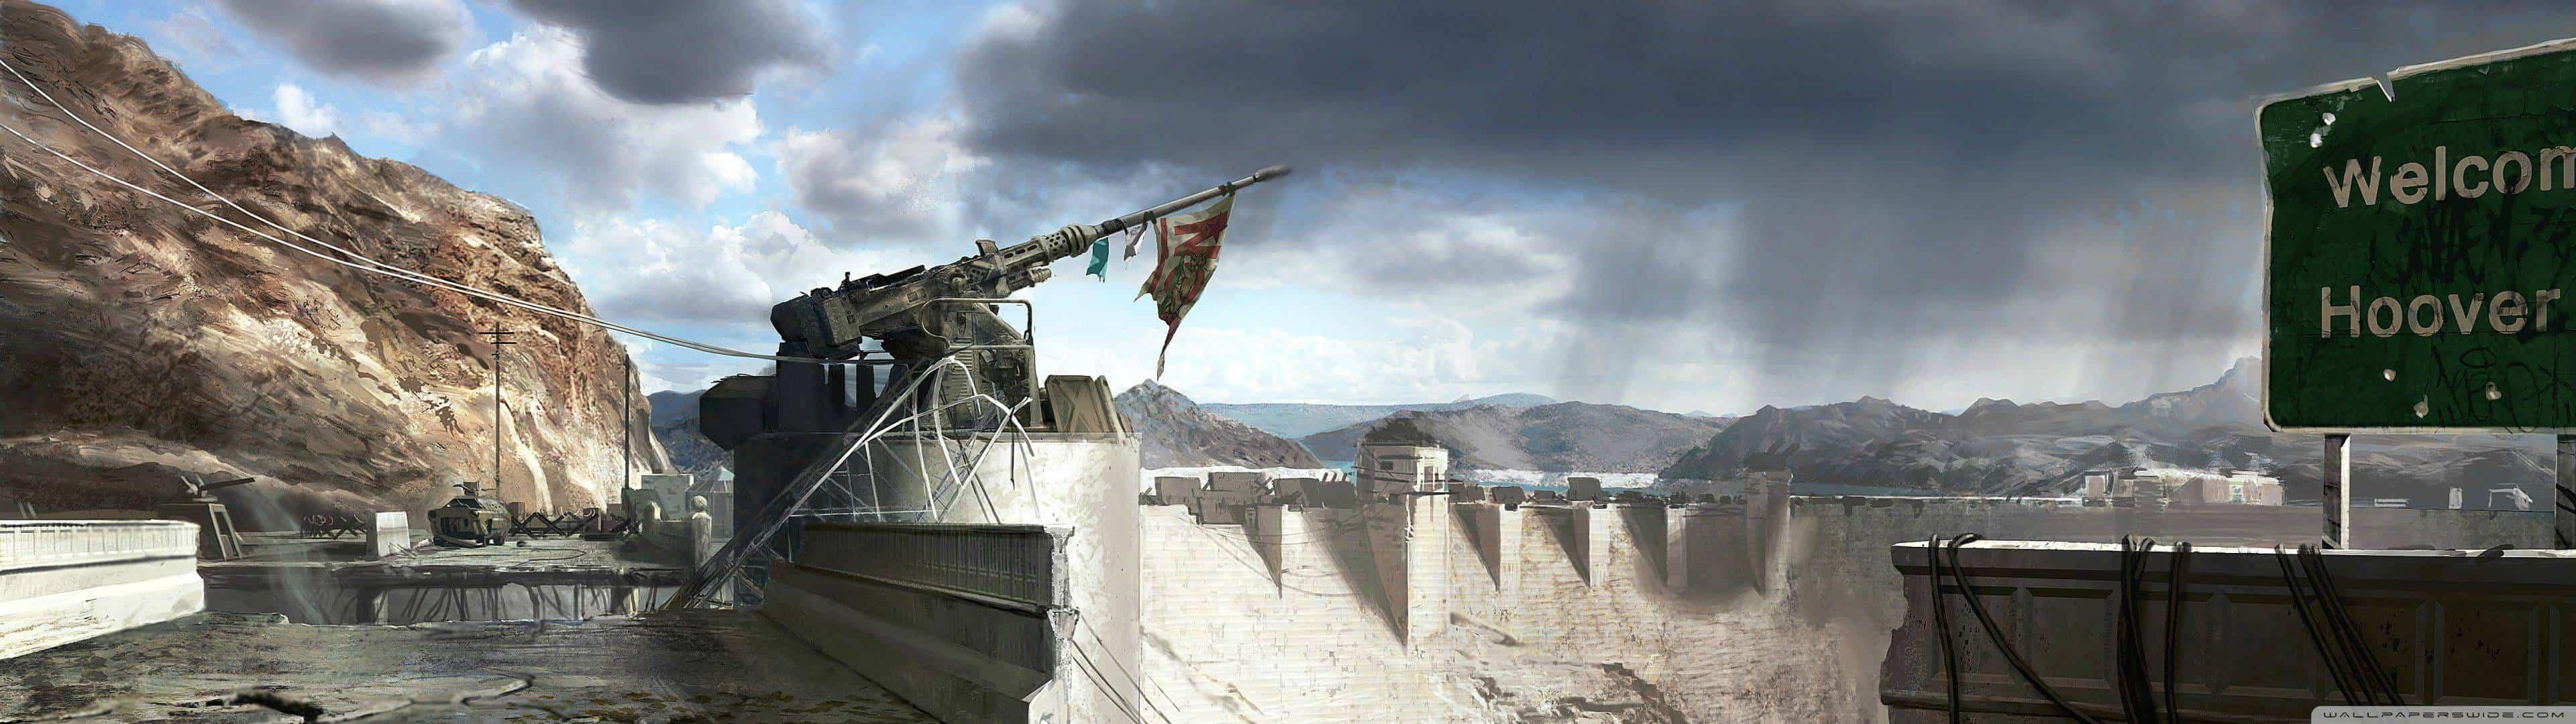 Fallout New Vegas Hoover Dam Dual Monitor Wallpaper Pixelz 3840x1080